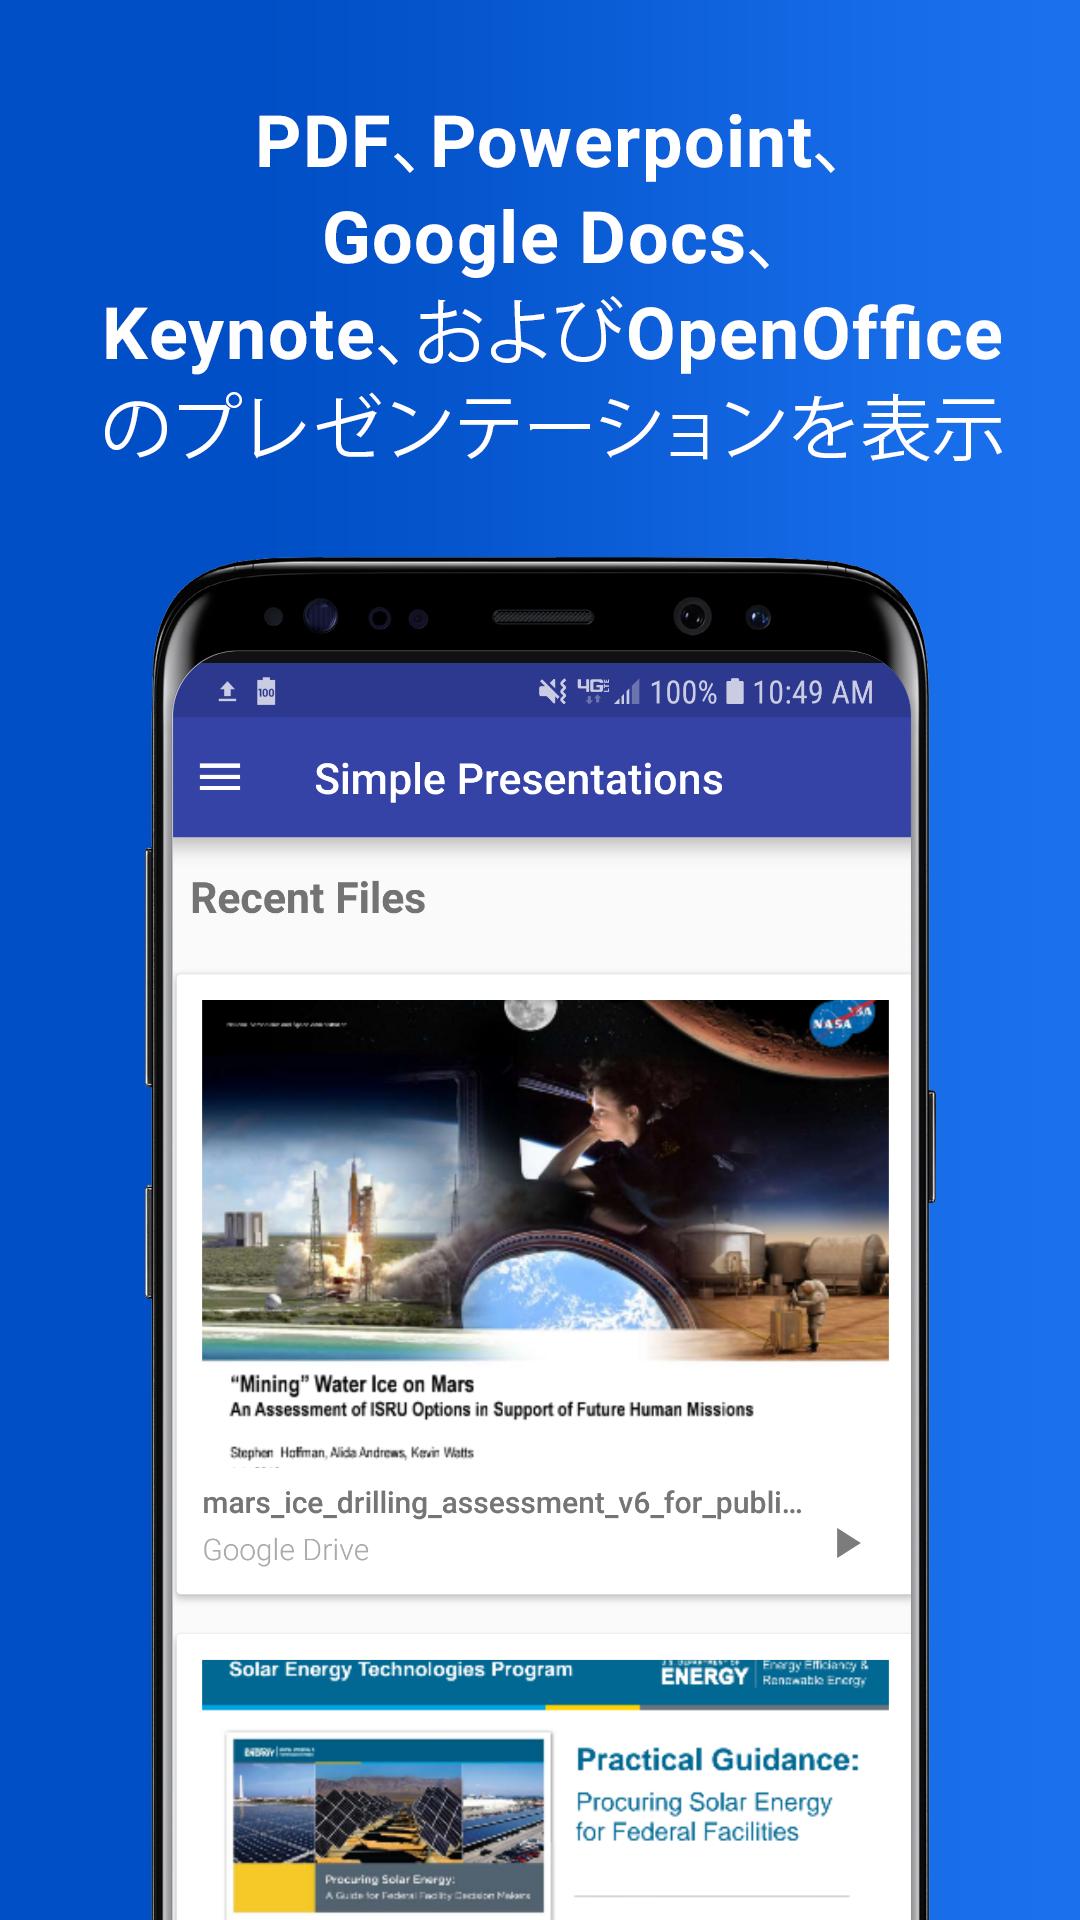 amazon co jp presentationsのpowerpoint keynote pdf google